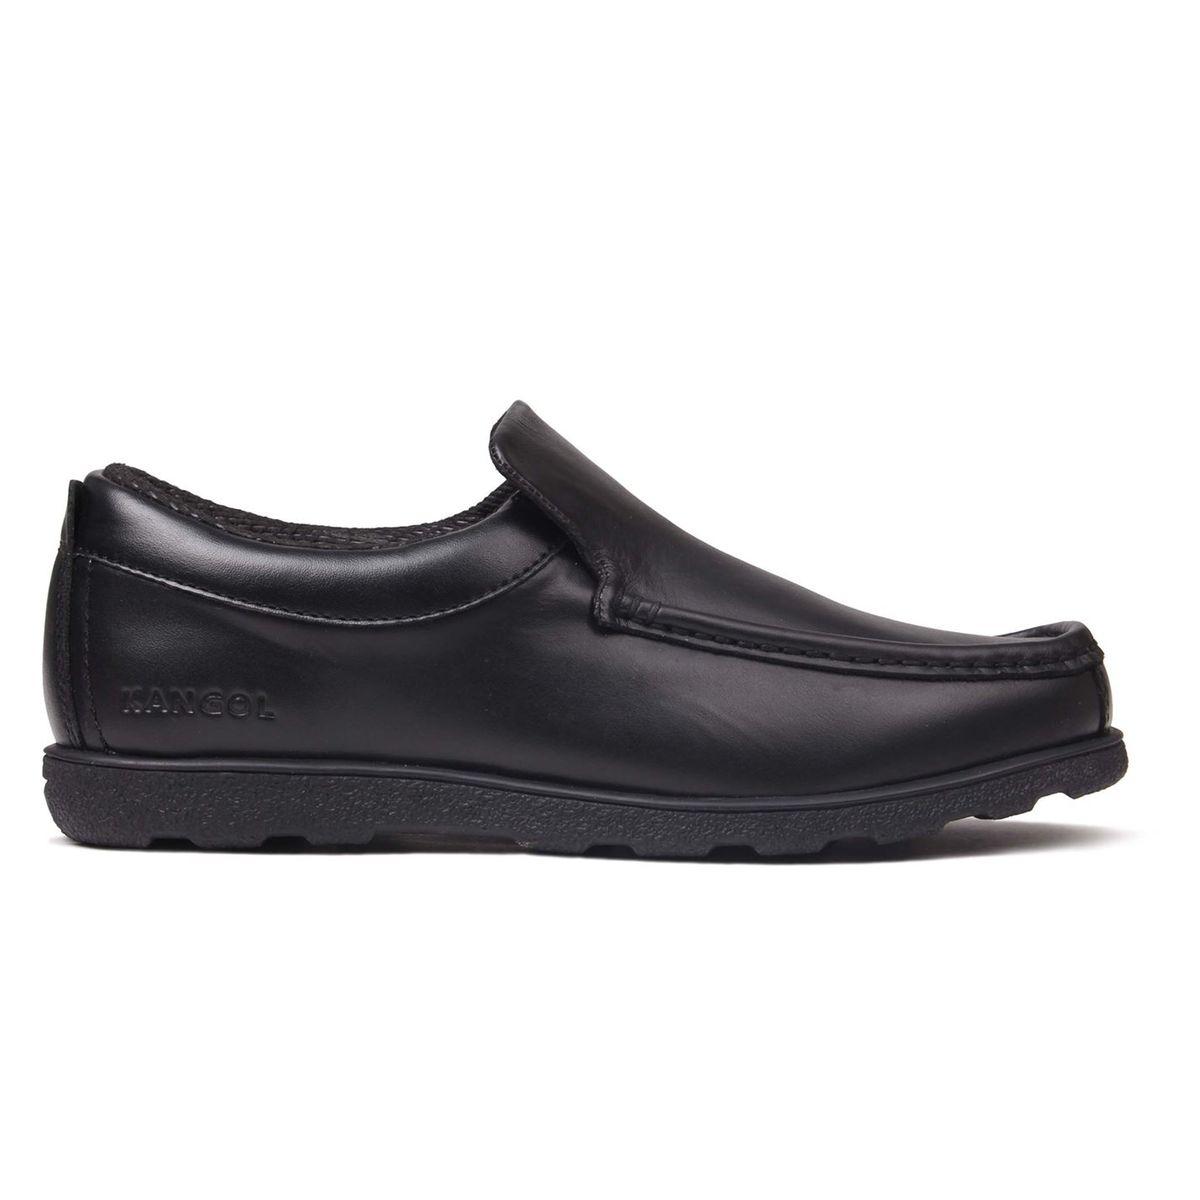 Chaussures mocassins habillé